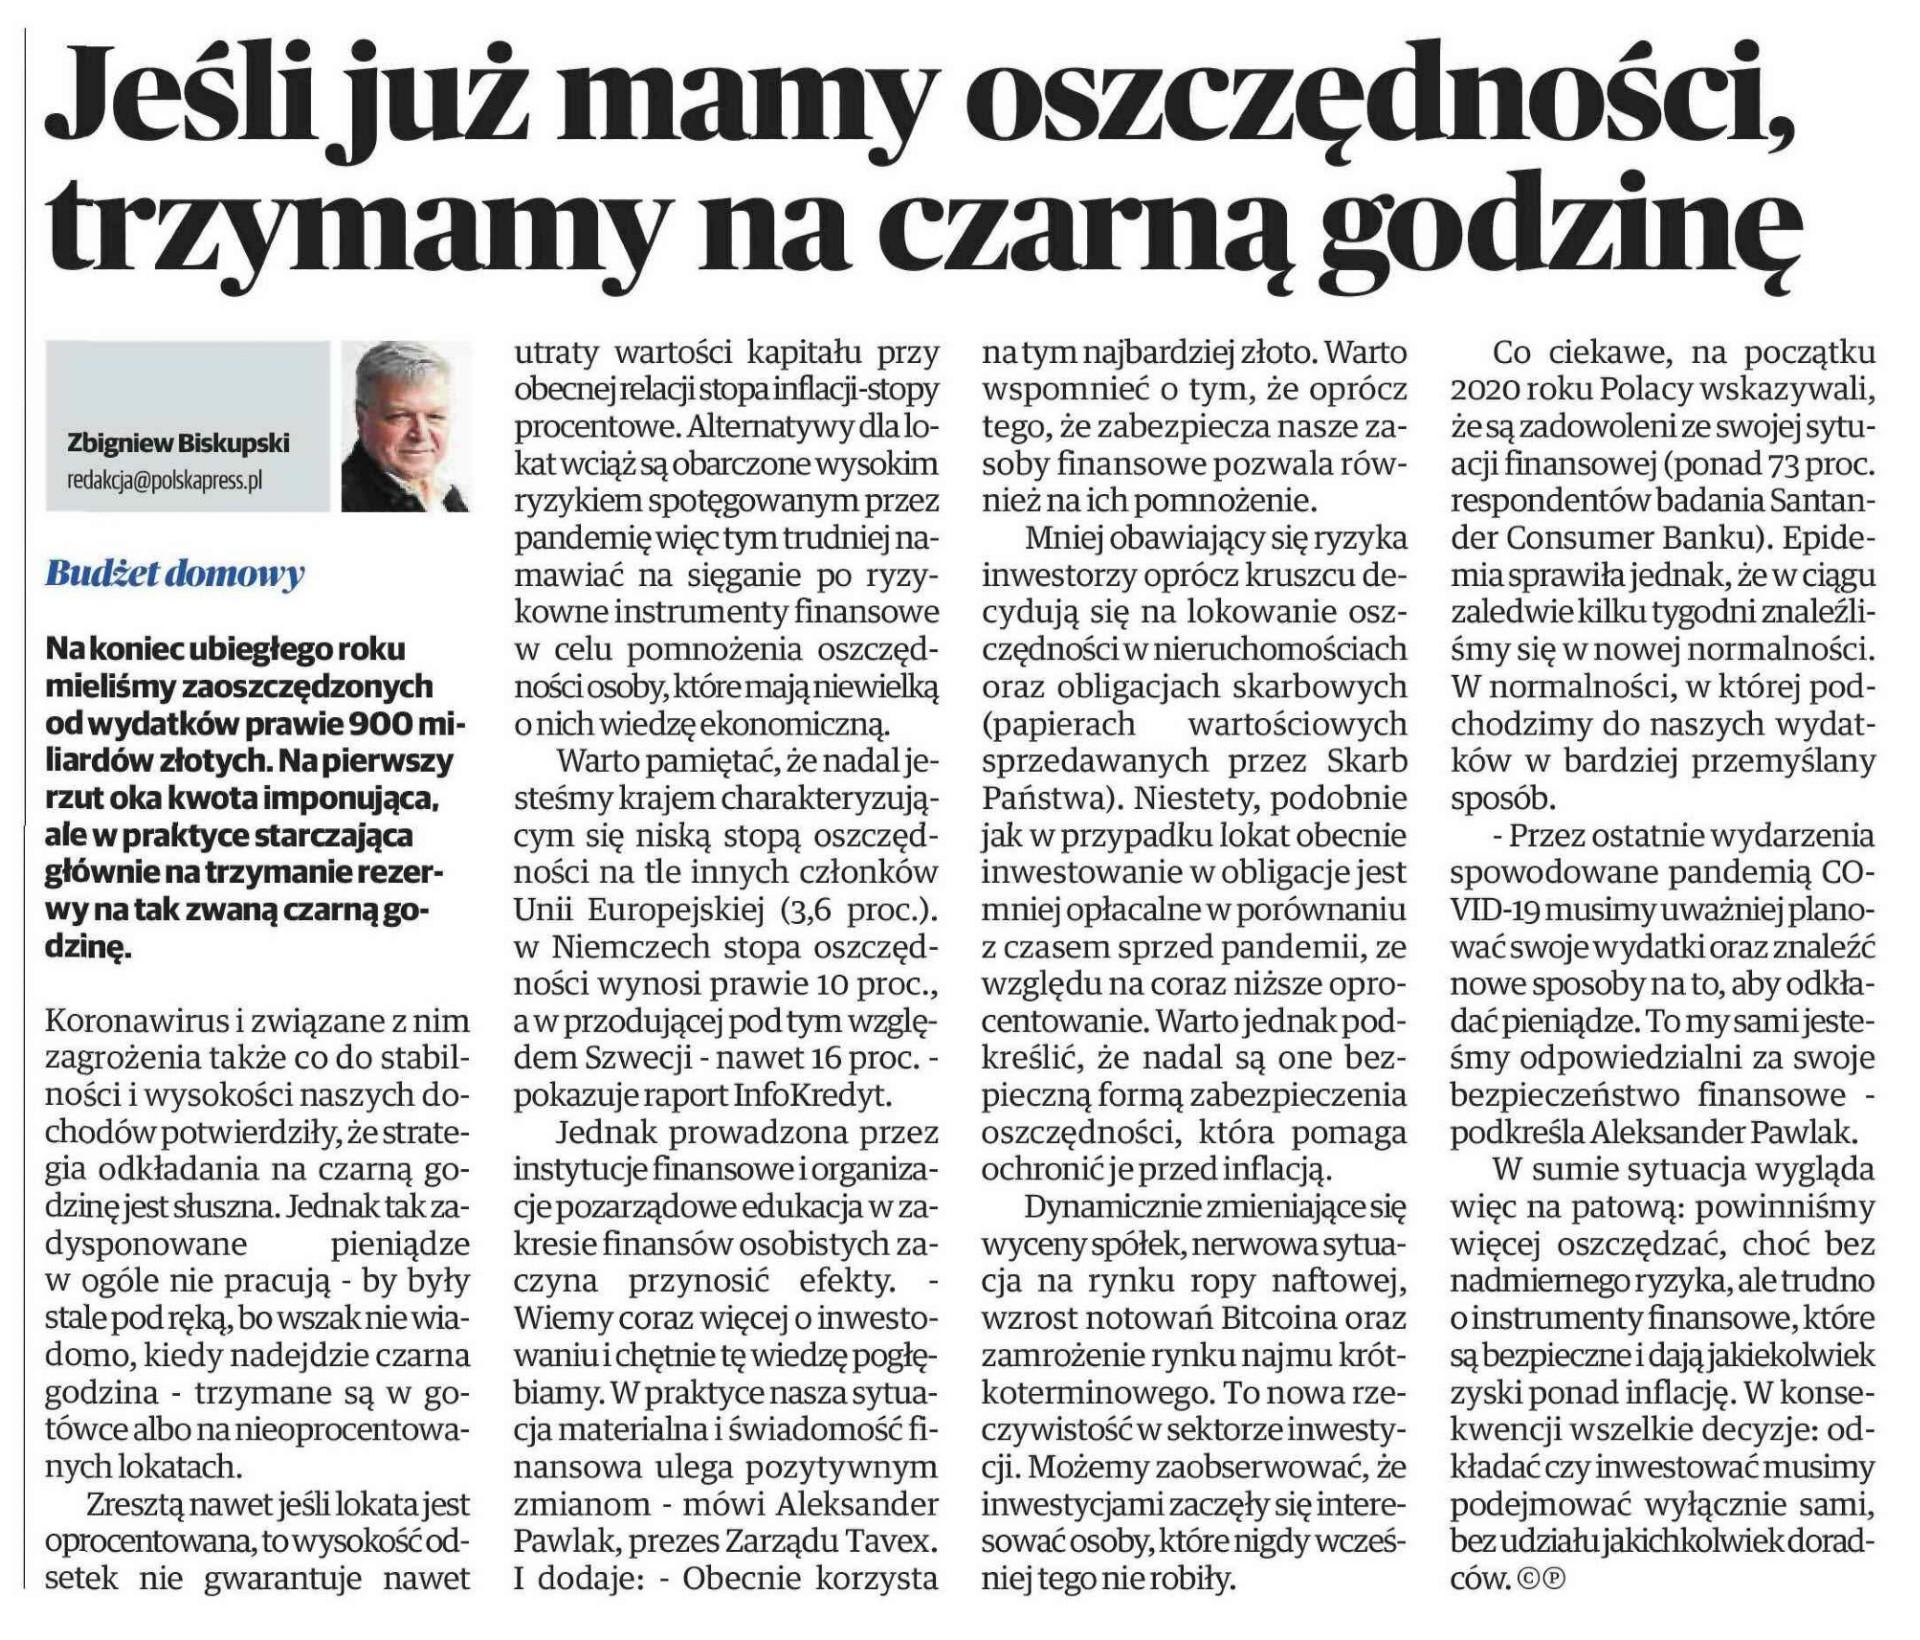 Aleksander Pawlak – Prezes Zarządu Tavex Sp. z o.o. – Gazeta Pomorska